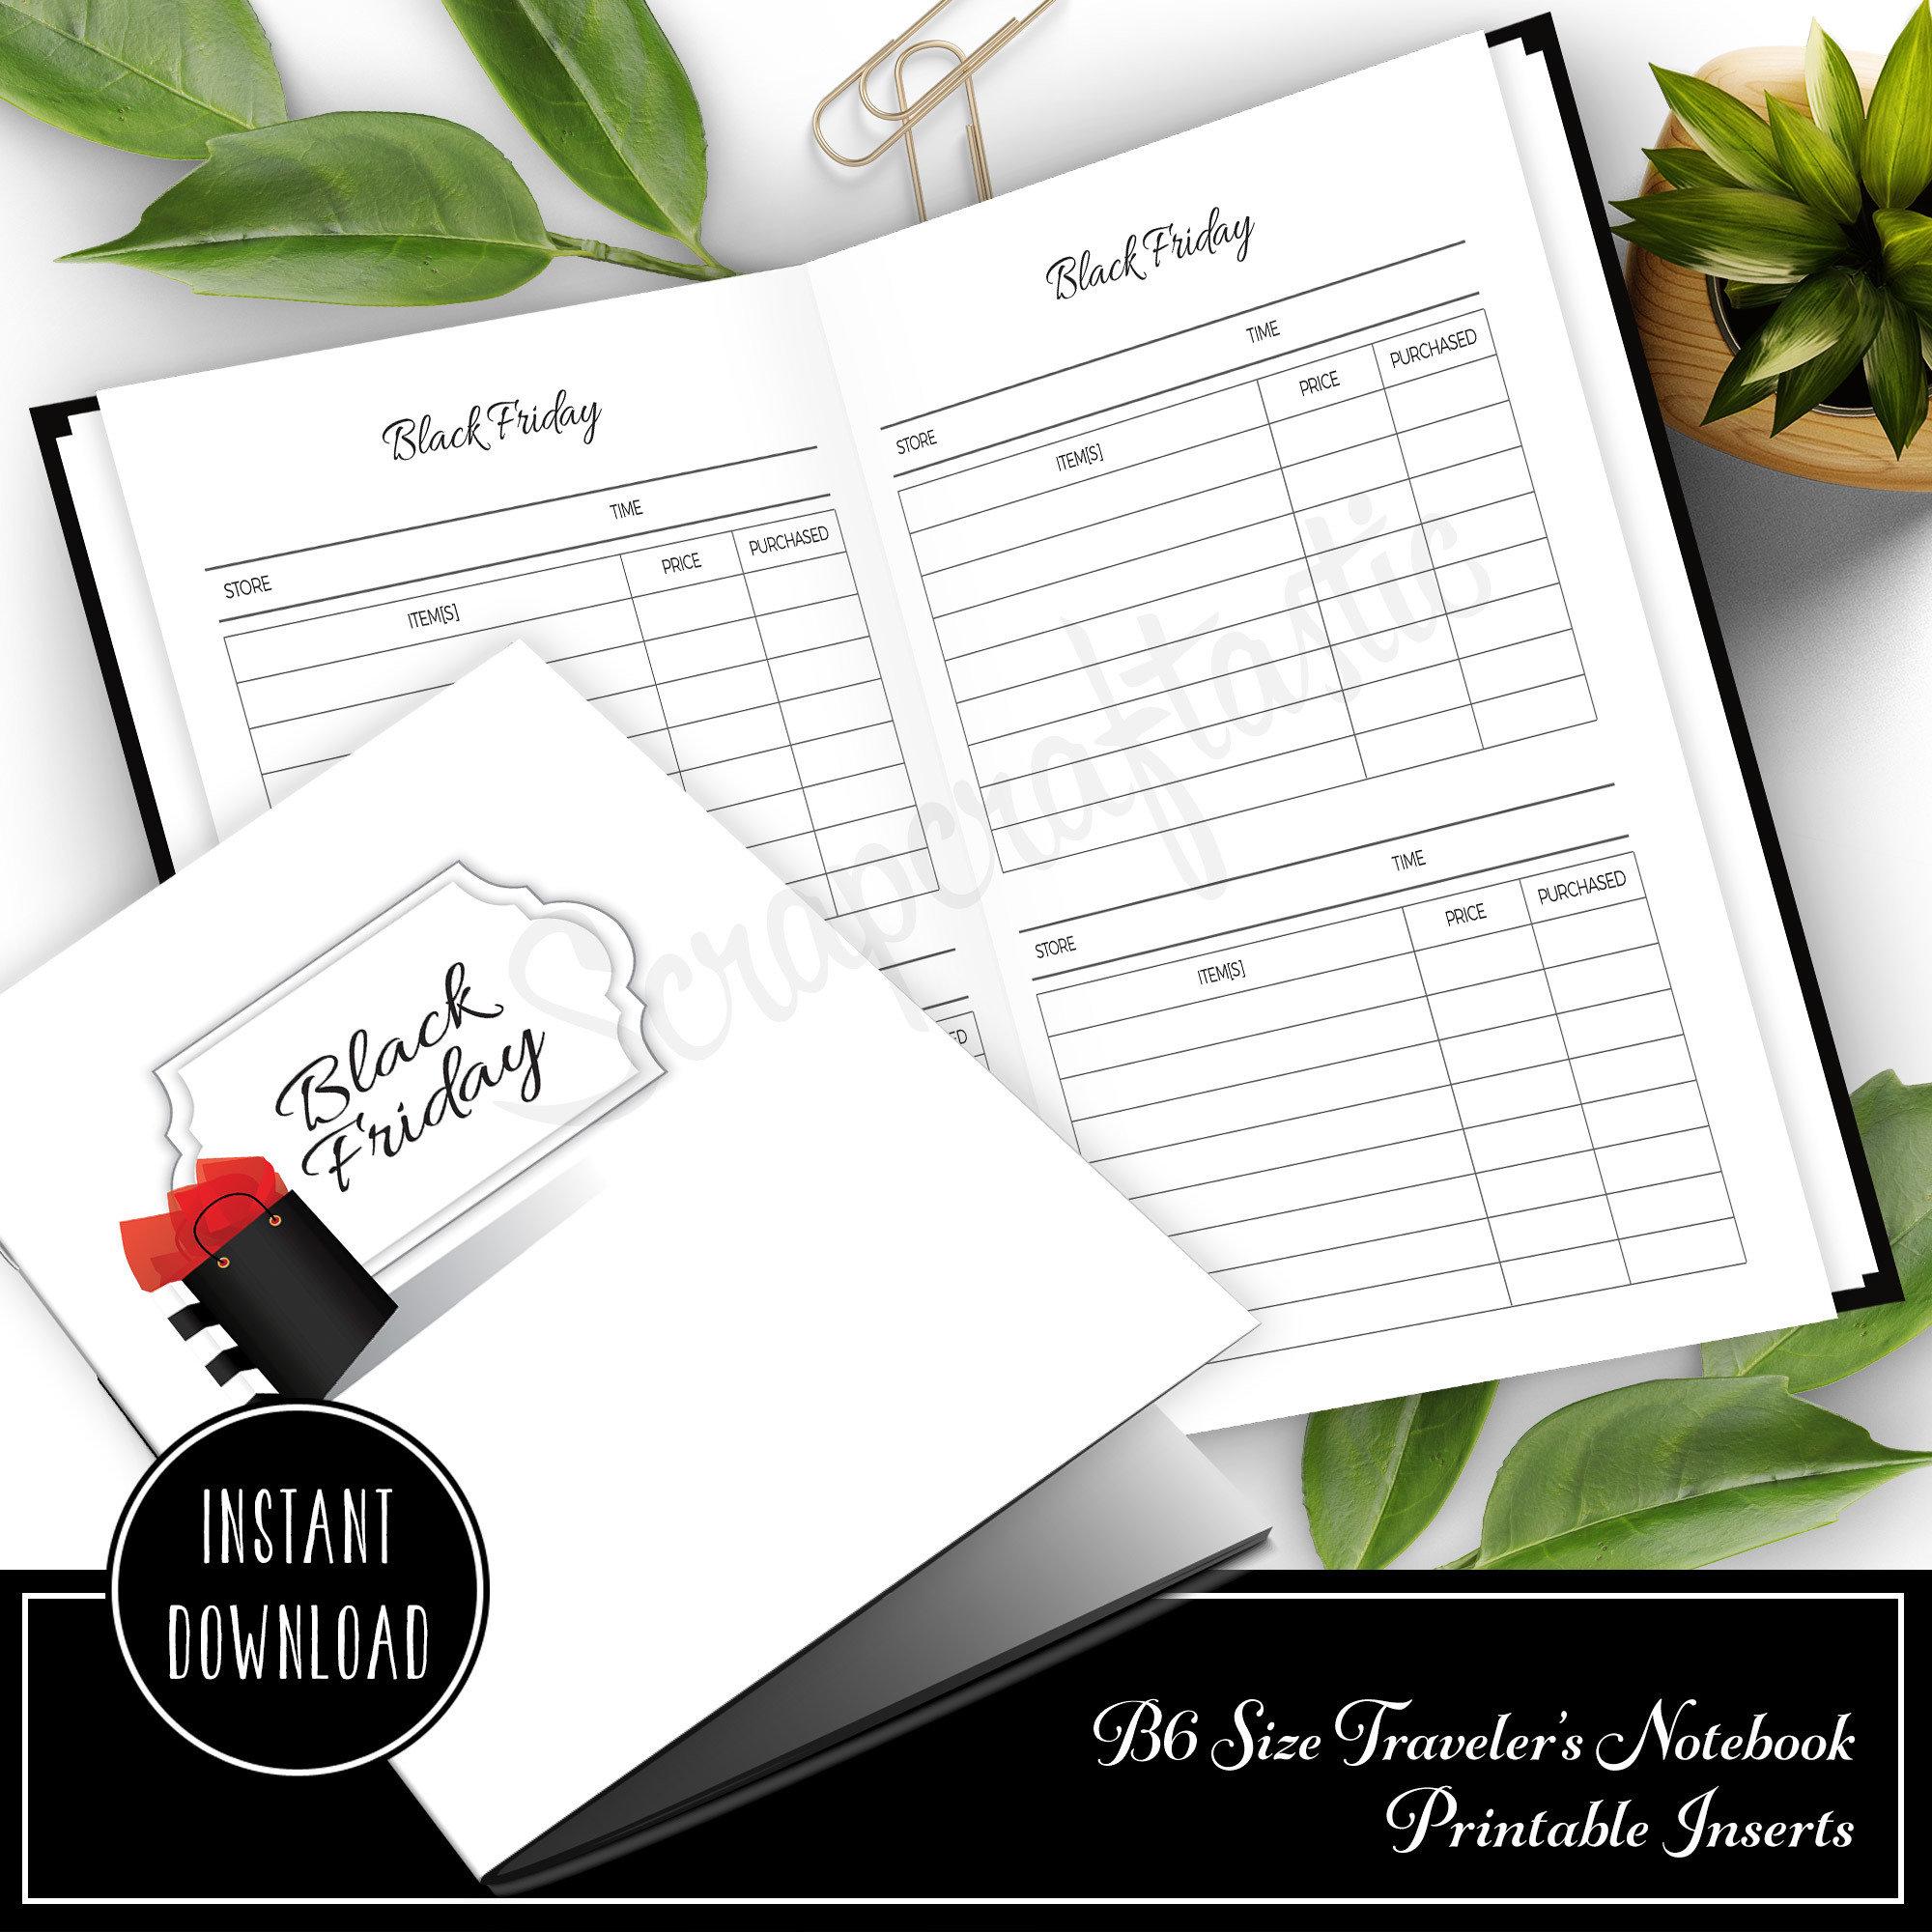 Black Friday Shopping B6 Size Traveler's Notebook Printable Planner Inserts 50027